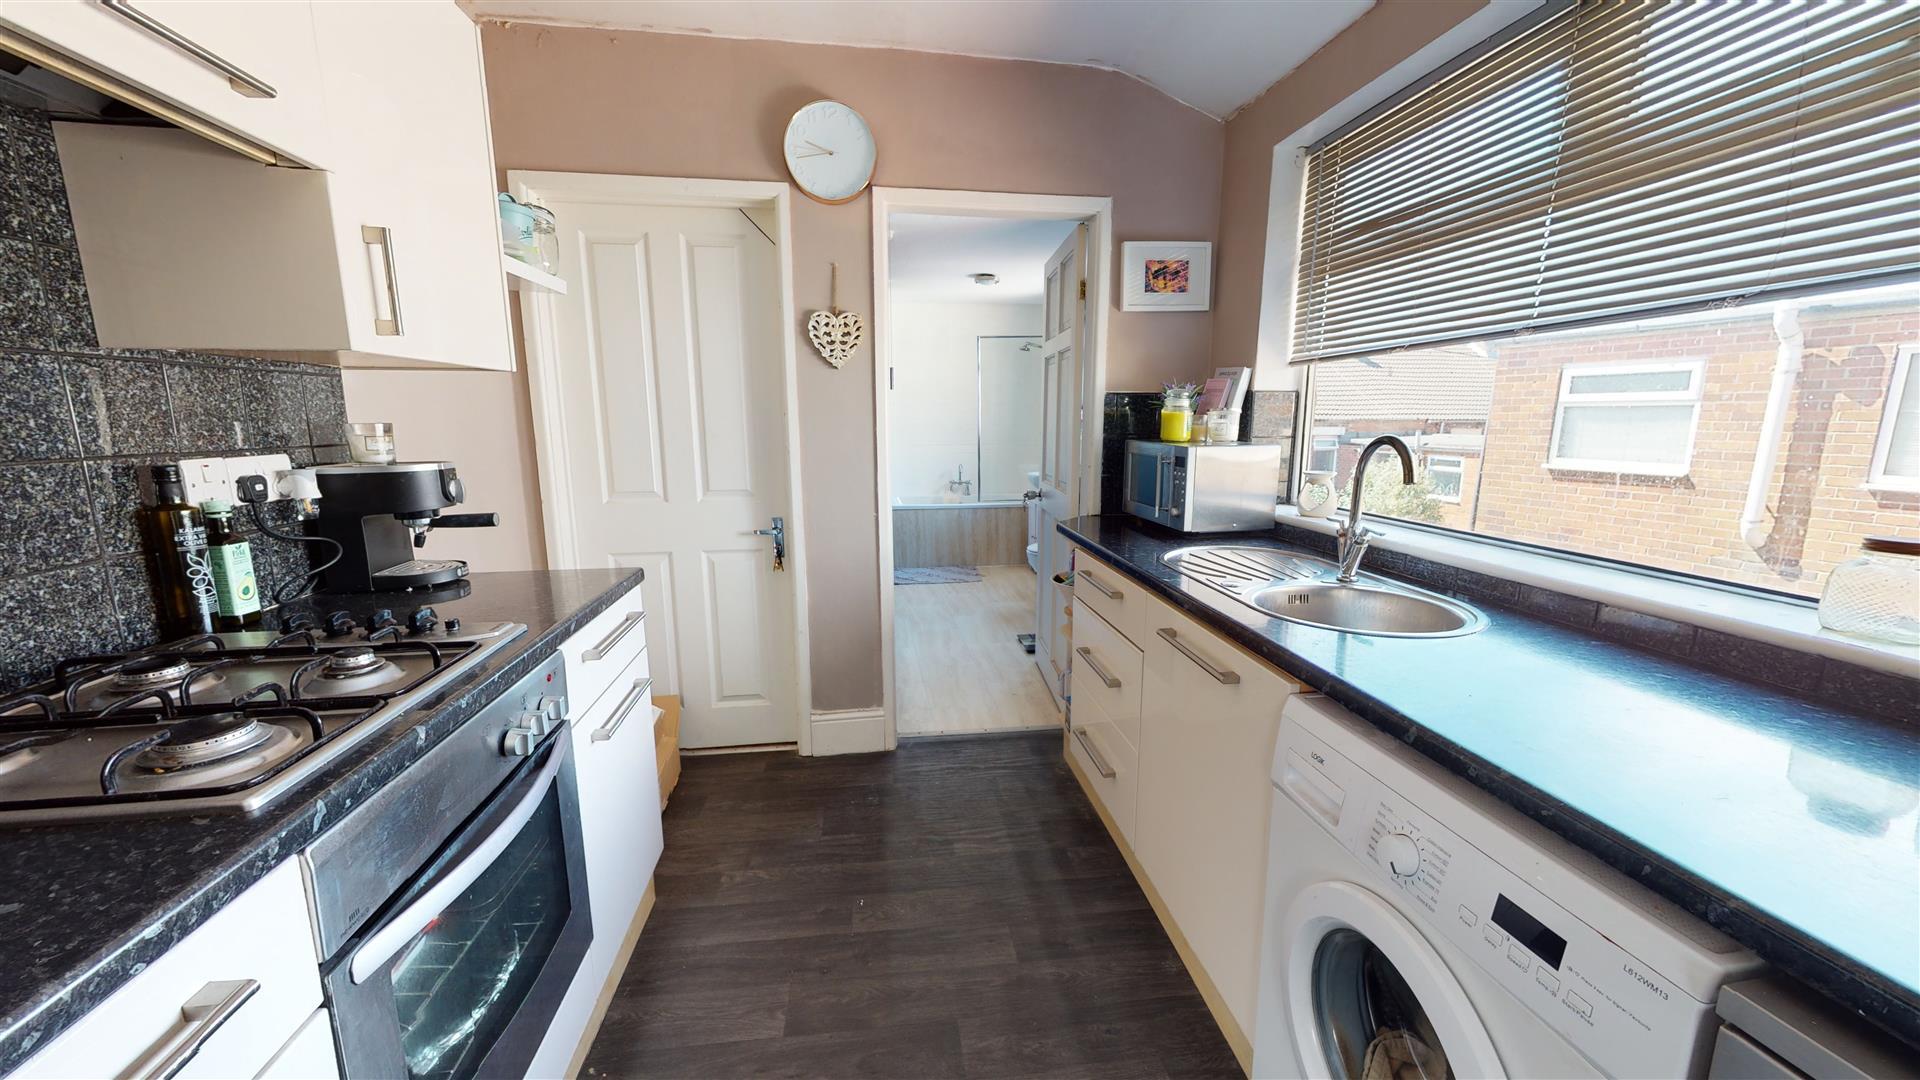 2 bed flat for sale in Wallsend, NE28 6NA - Property Image 1